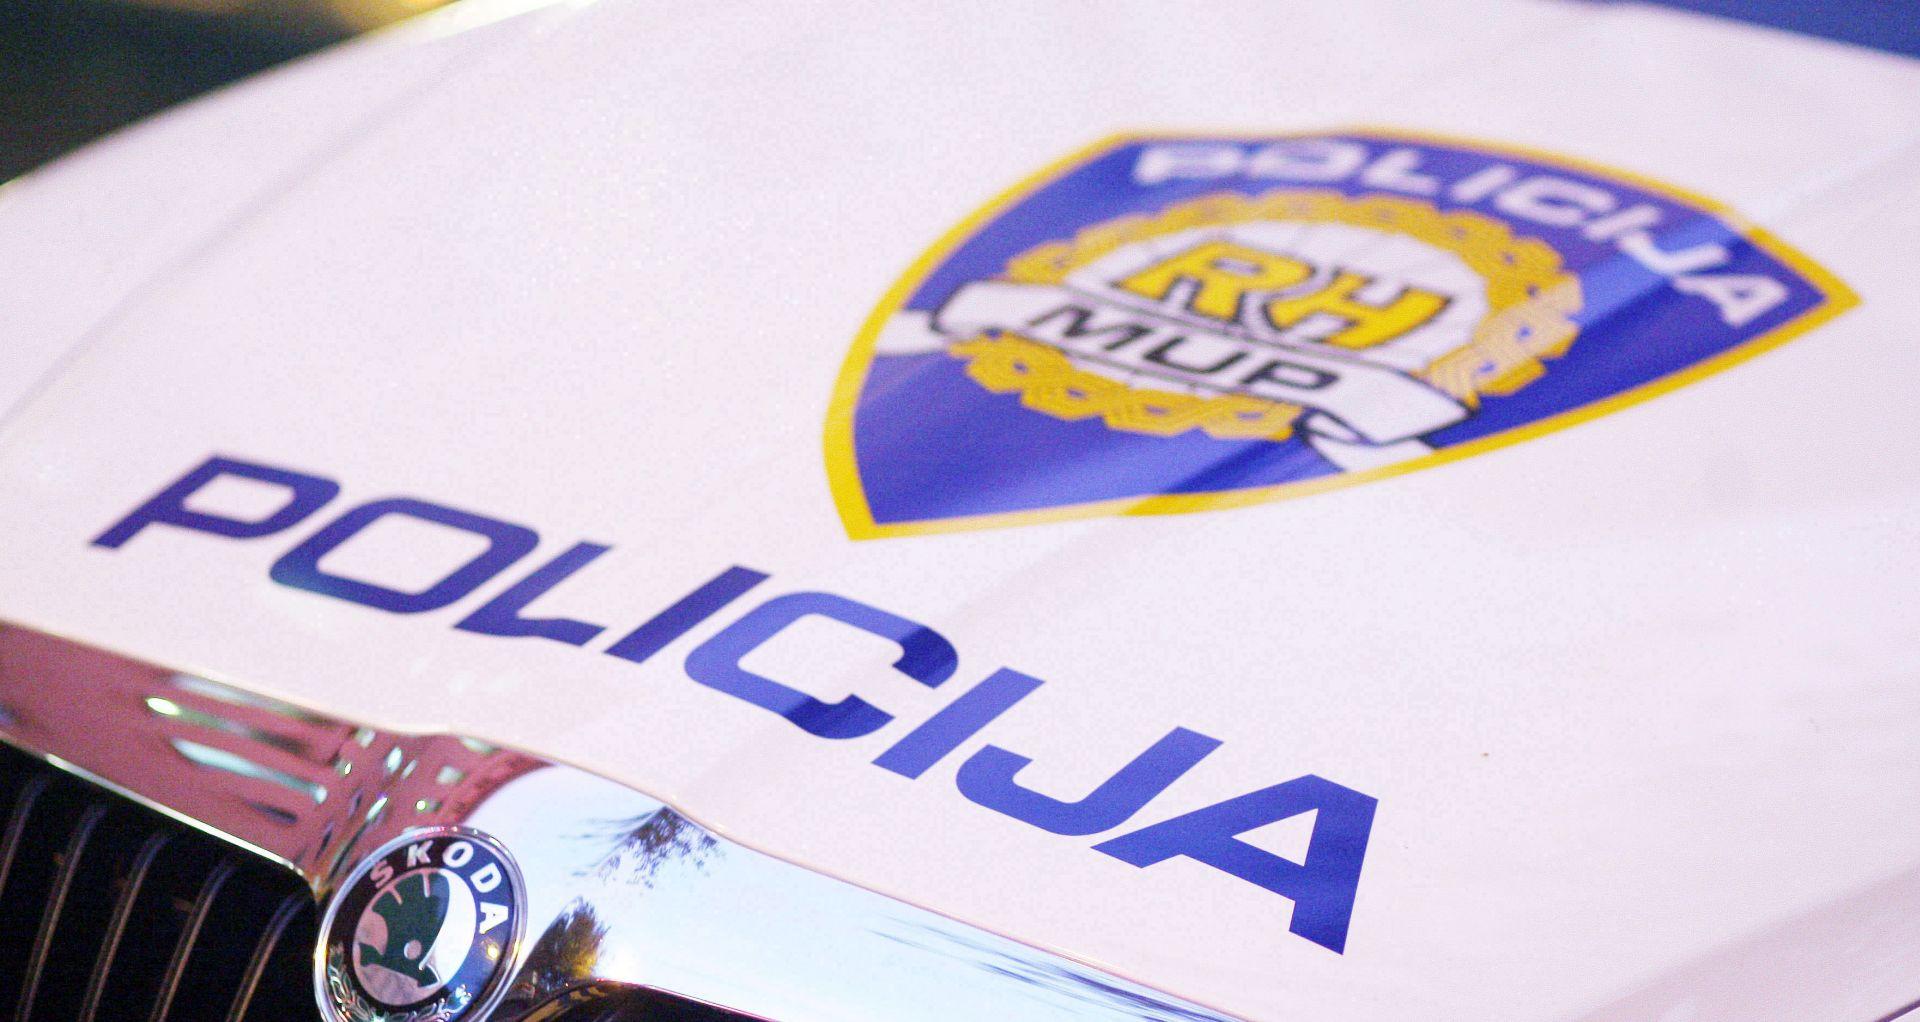 HDZ-ov gradonačelnik Požege izudarao novinara i udario njegovom glavom o zid